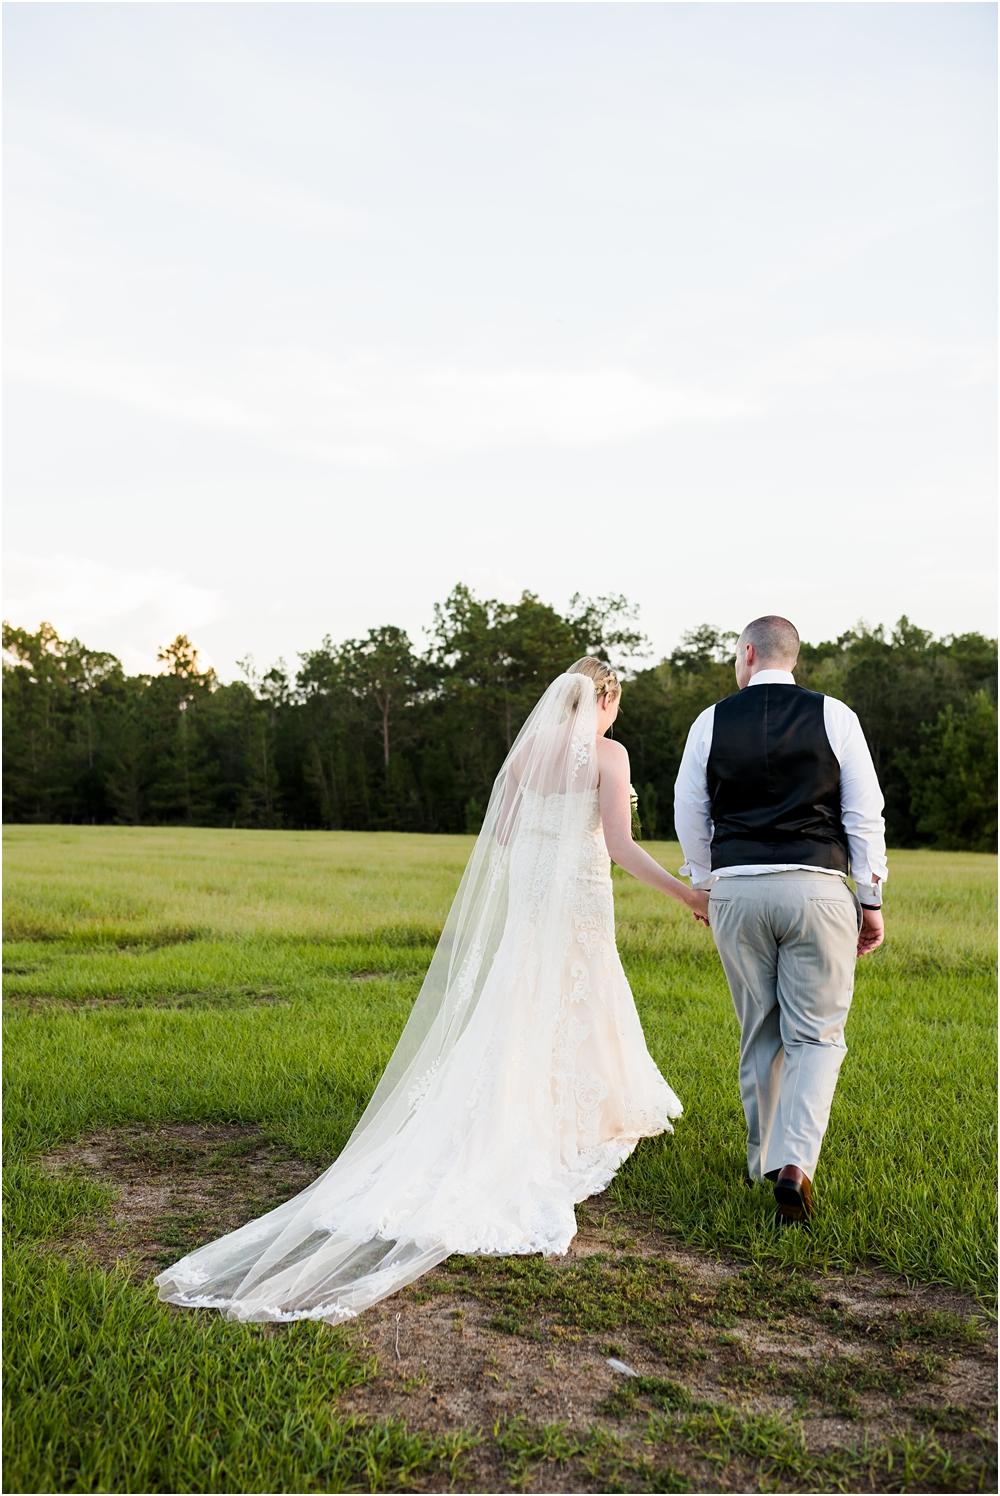 matthew-wedding-kiersten-stevenson-photography-30a-panama-city-beach-dothan-tallahassee-(383-of-579).JPG